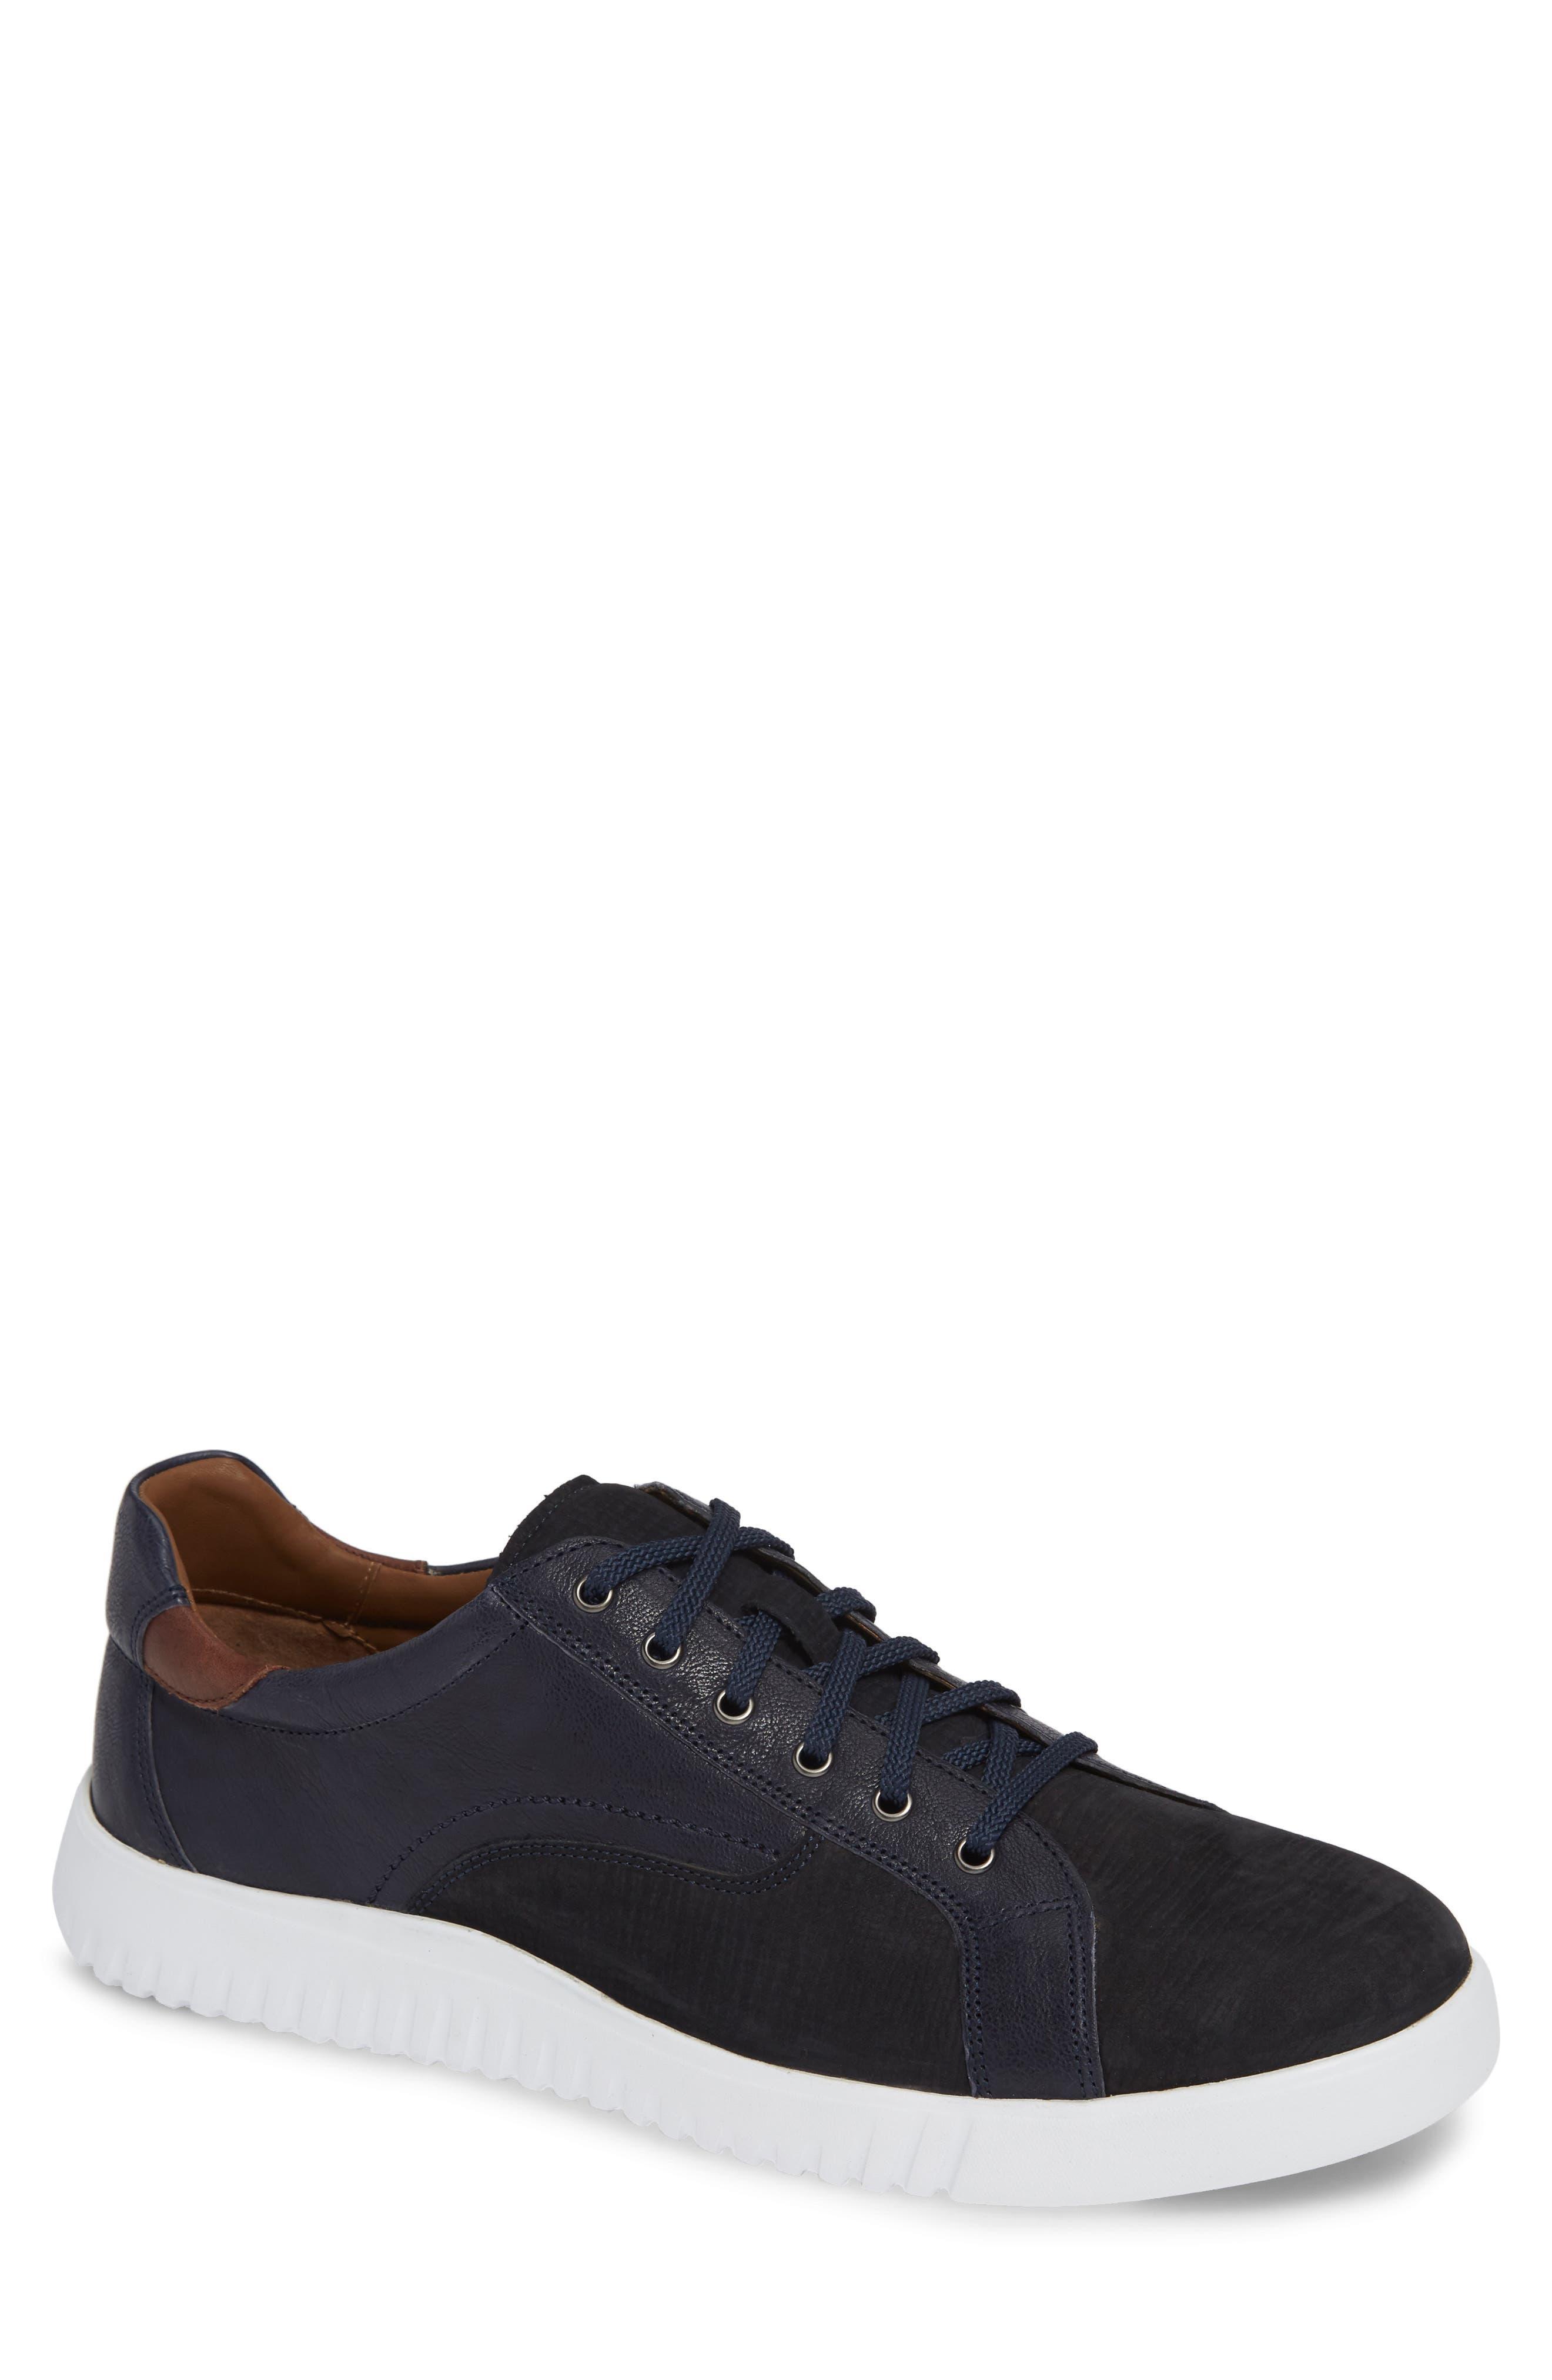 JOHNSTON & MURPHY, McFarland Sneaker, Main thumbnail 1, color, NAVY NUBUCK